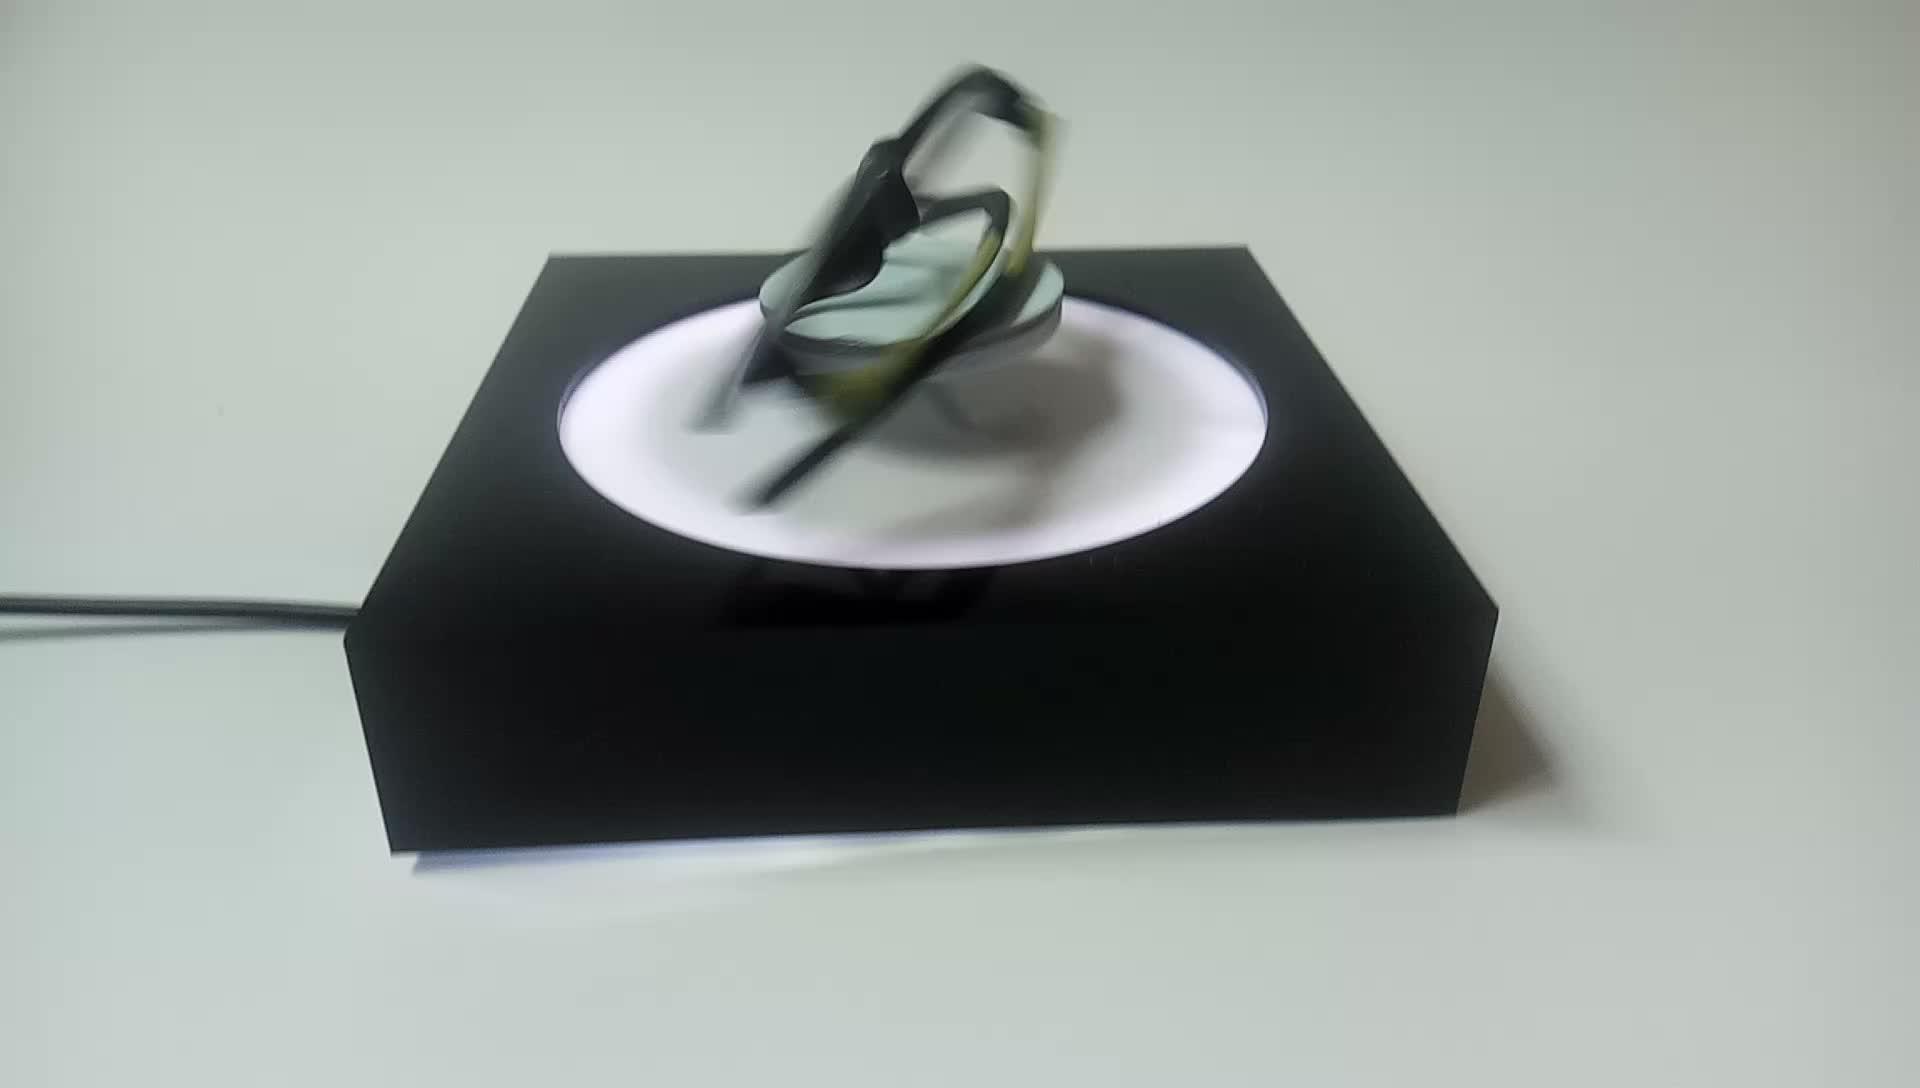 Acrylic magnetic floating levitation display for eyeglass